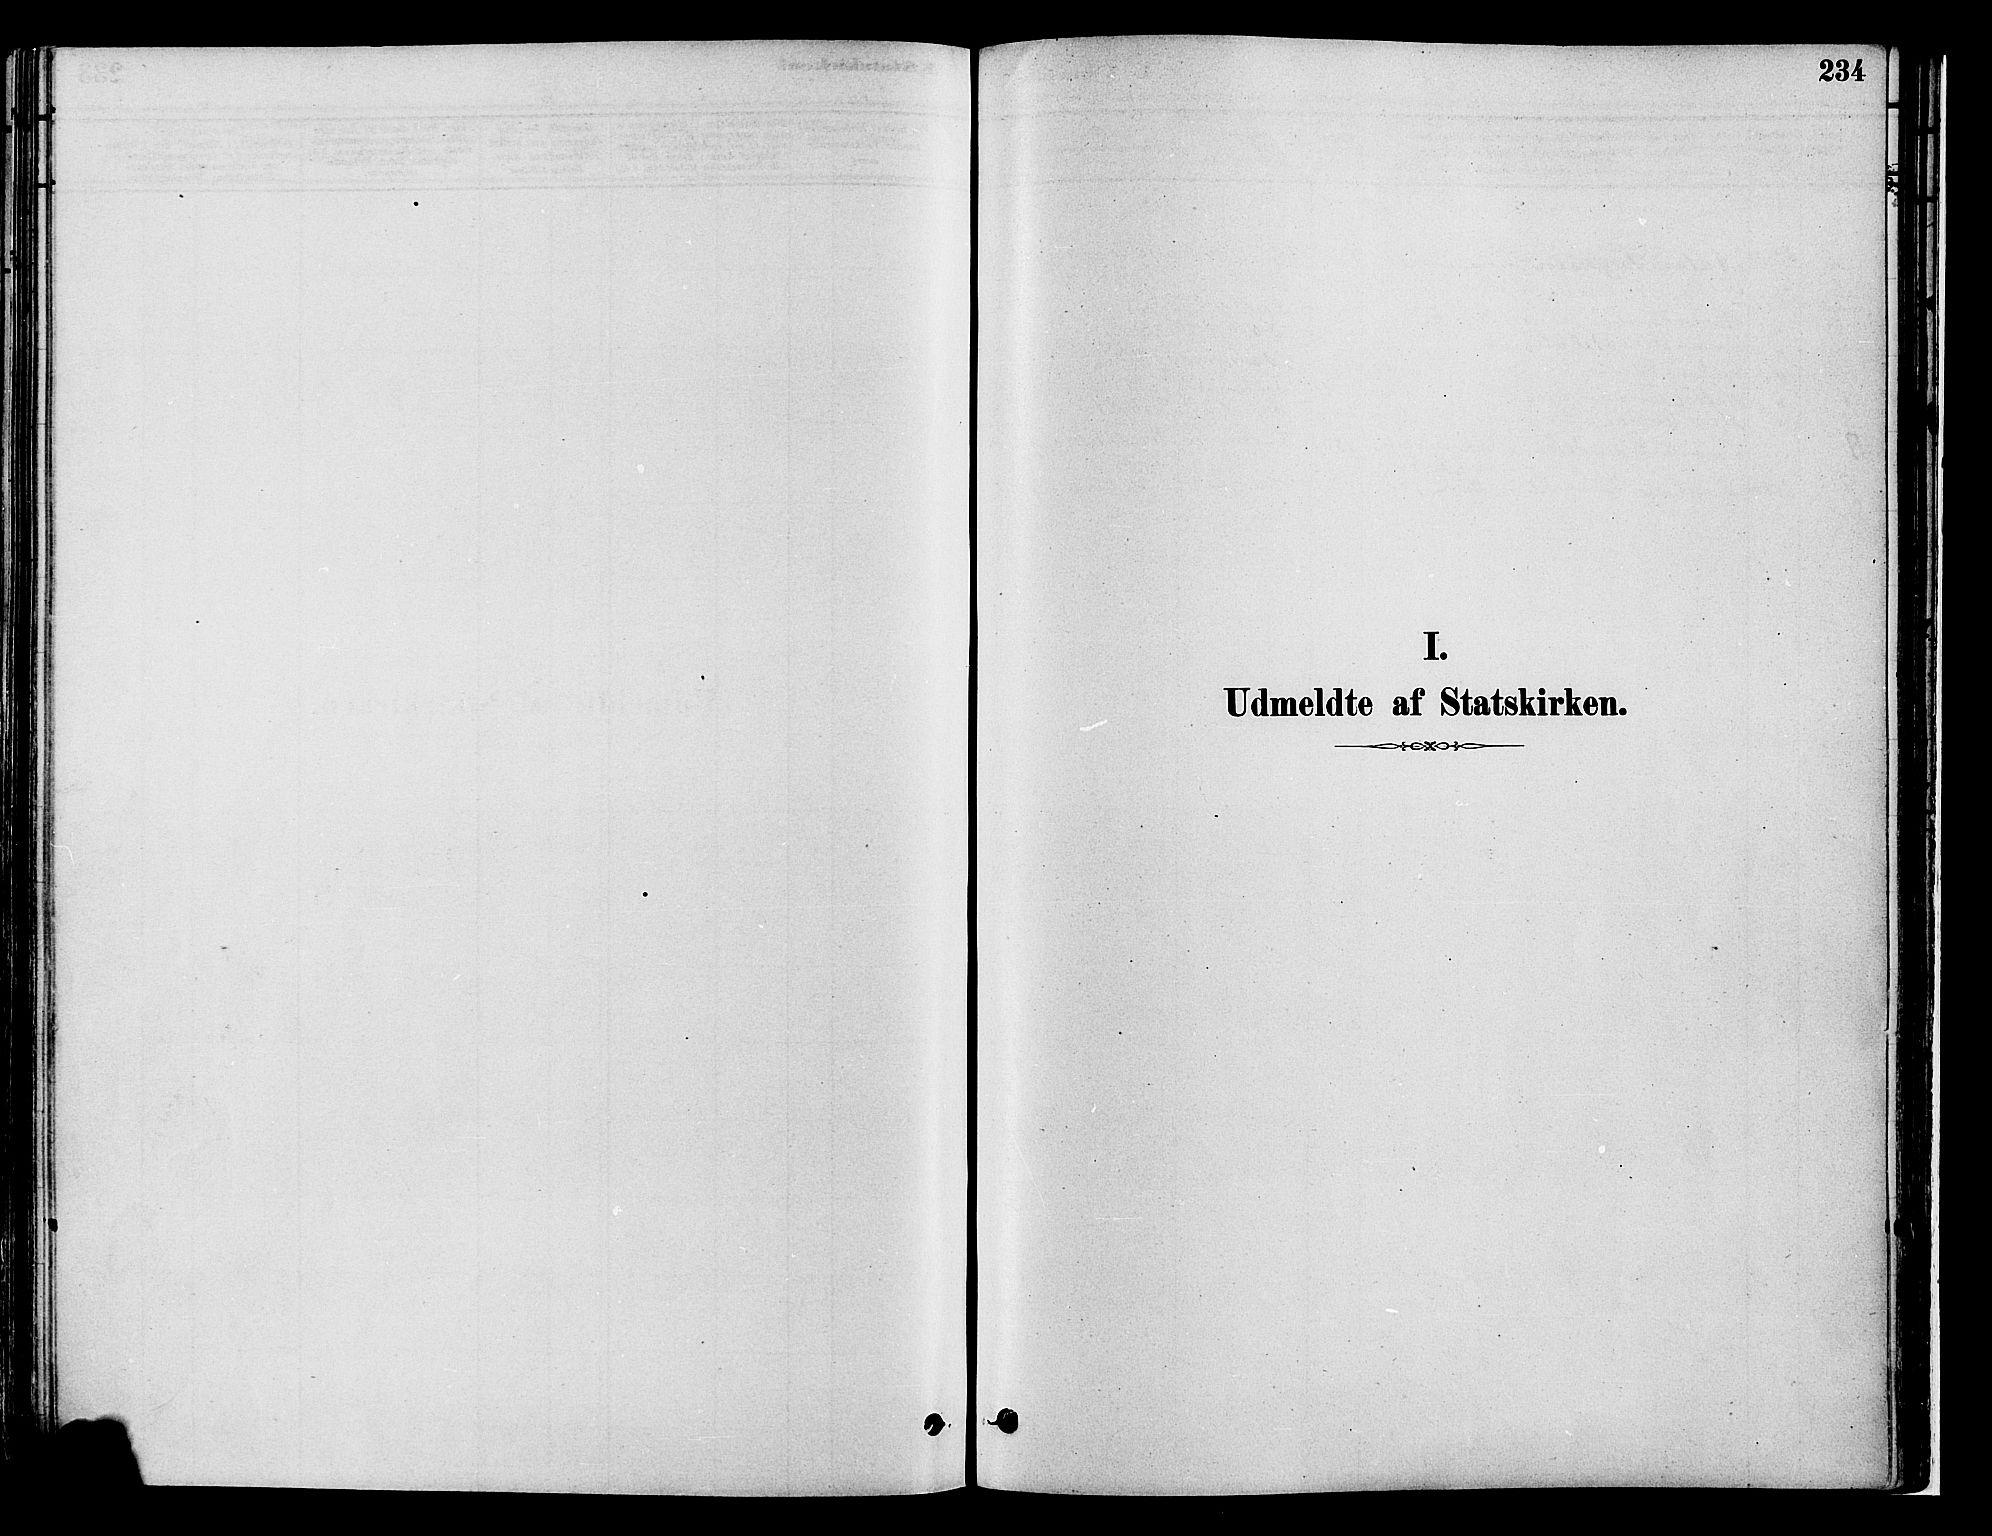 SAH, Gran prestekontor, Ministerialbok nr. 14, 1880-1889, s. 234